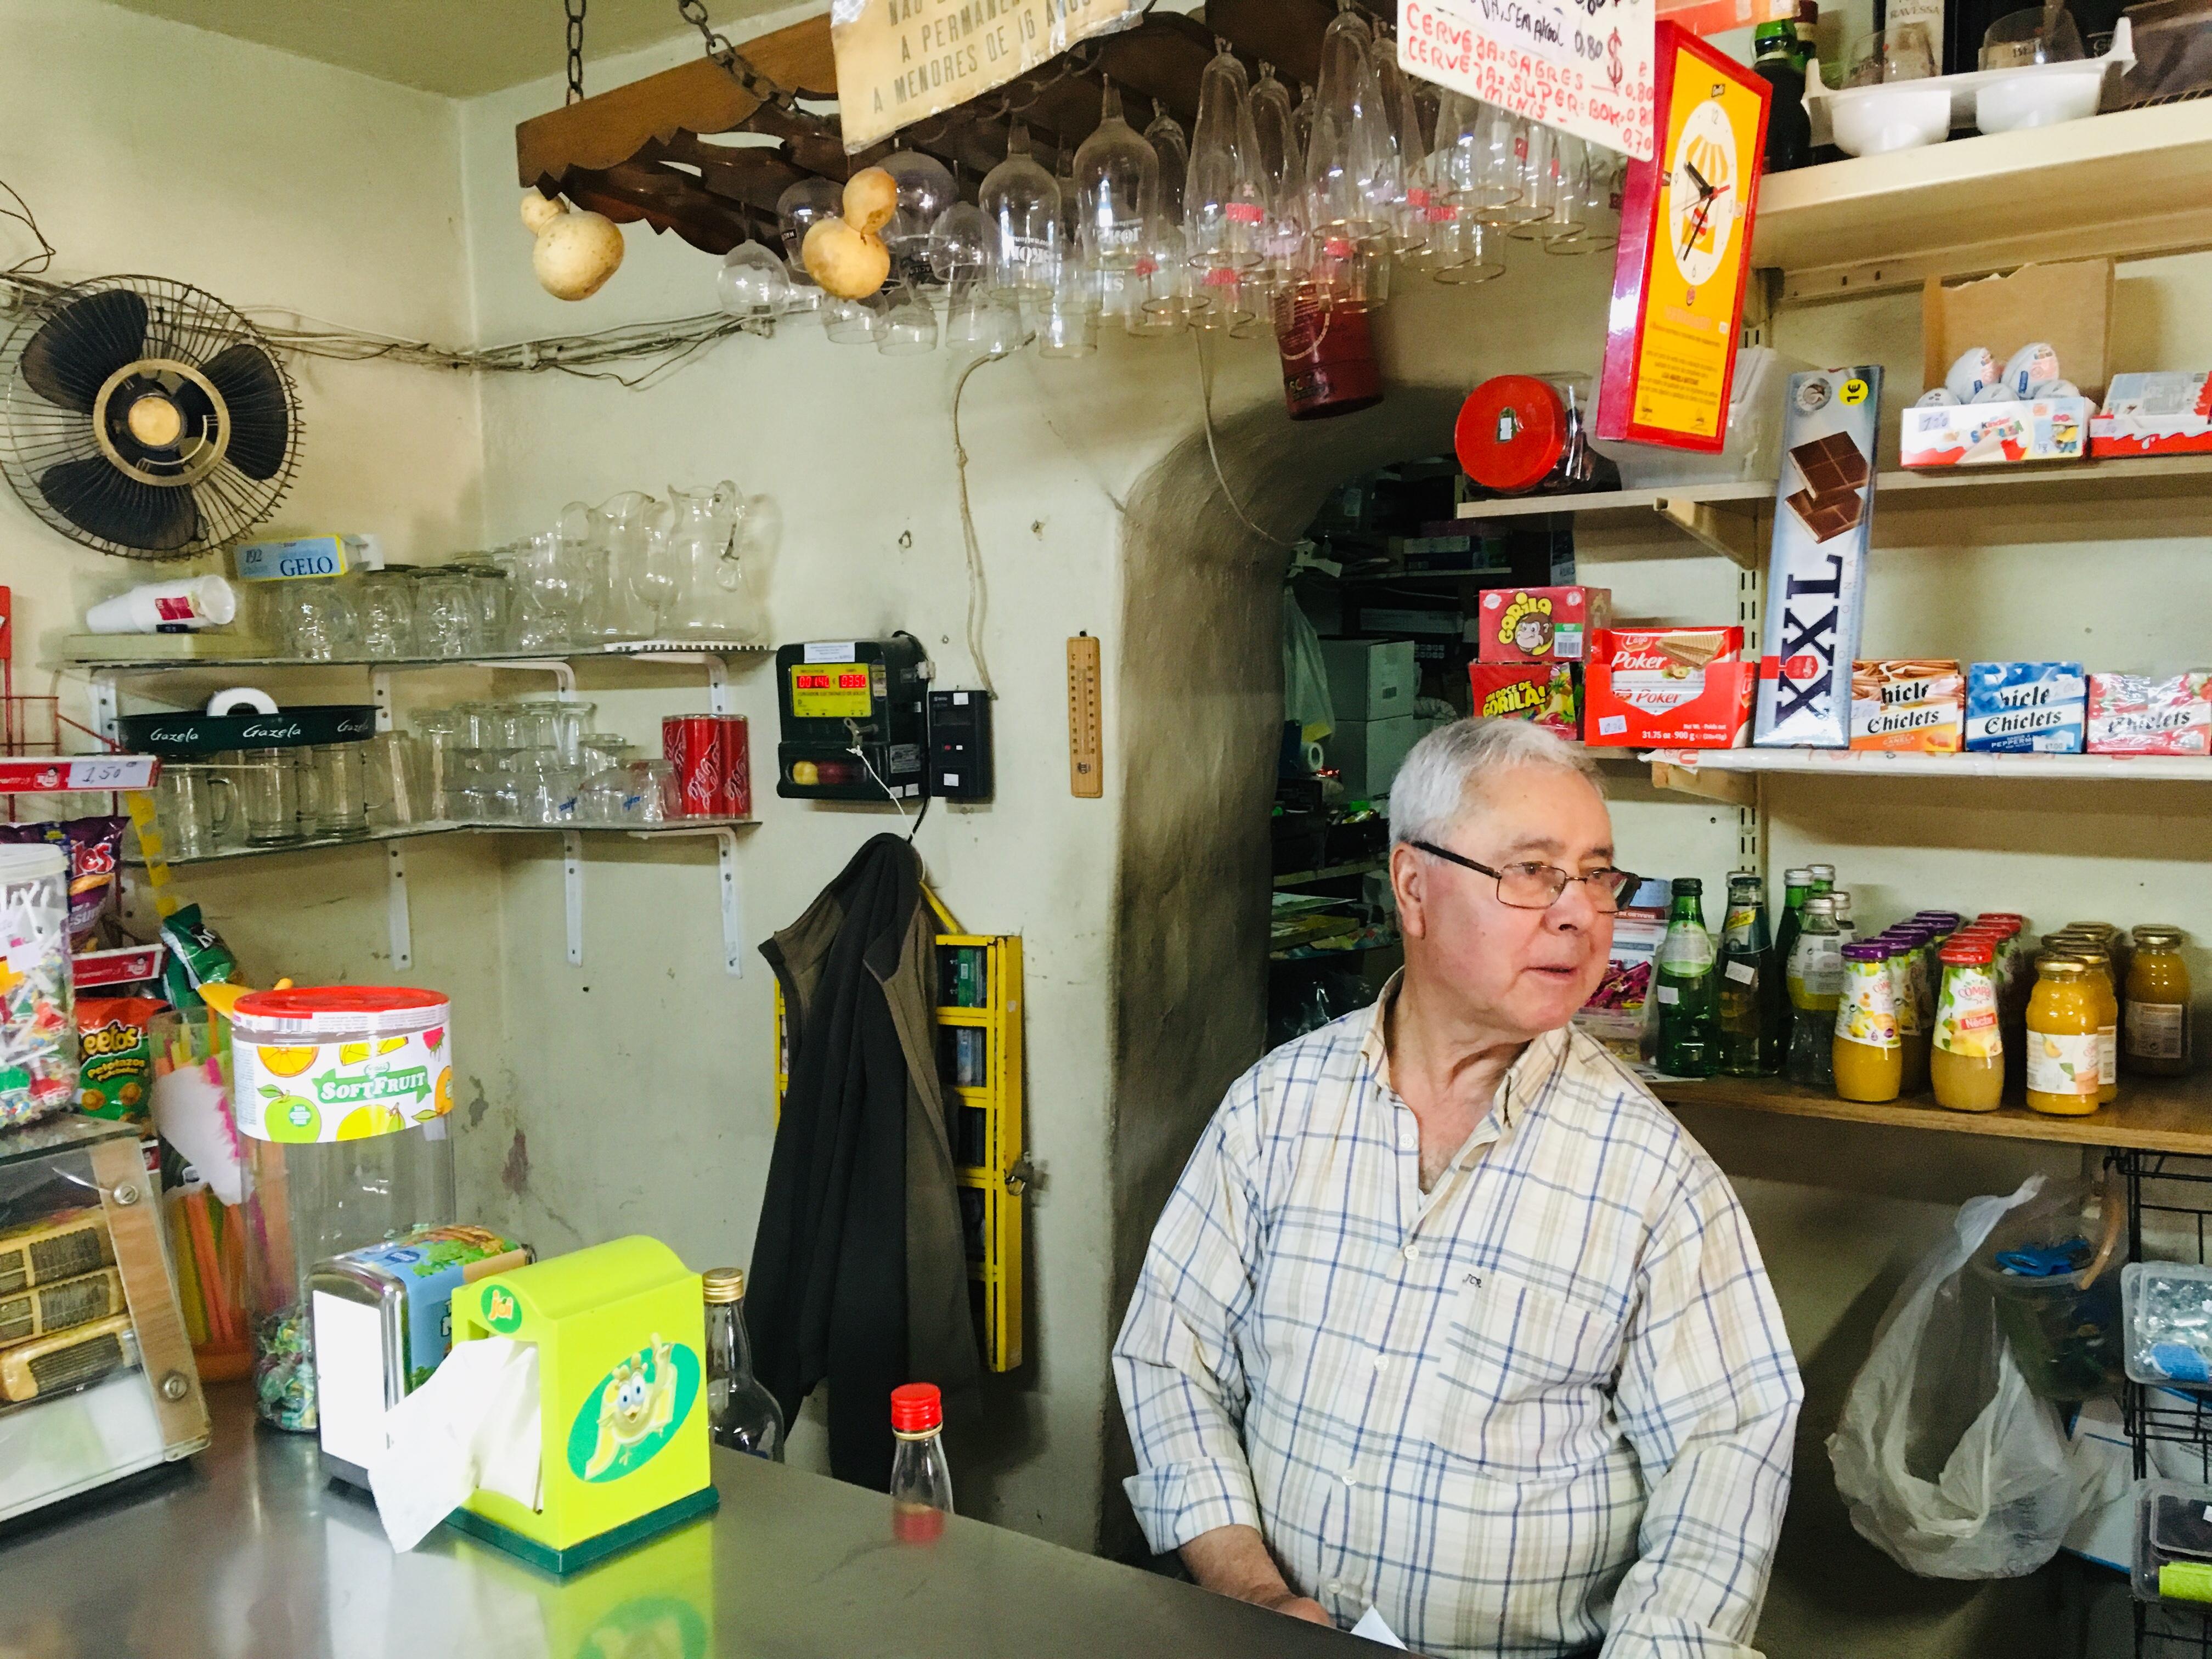 Senhor Alfonso do Café Alberquerque in Sezures